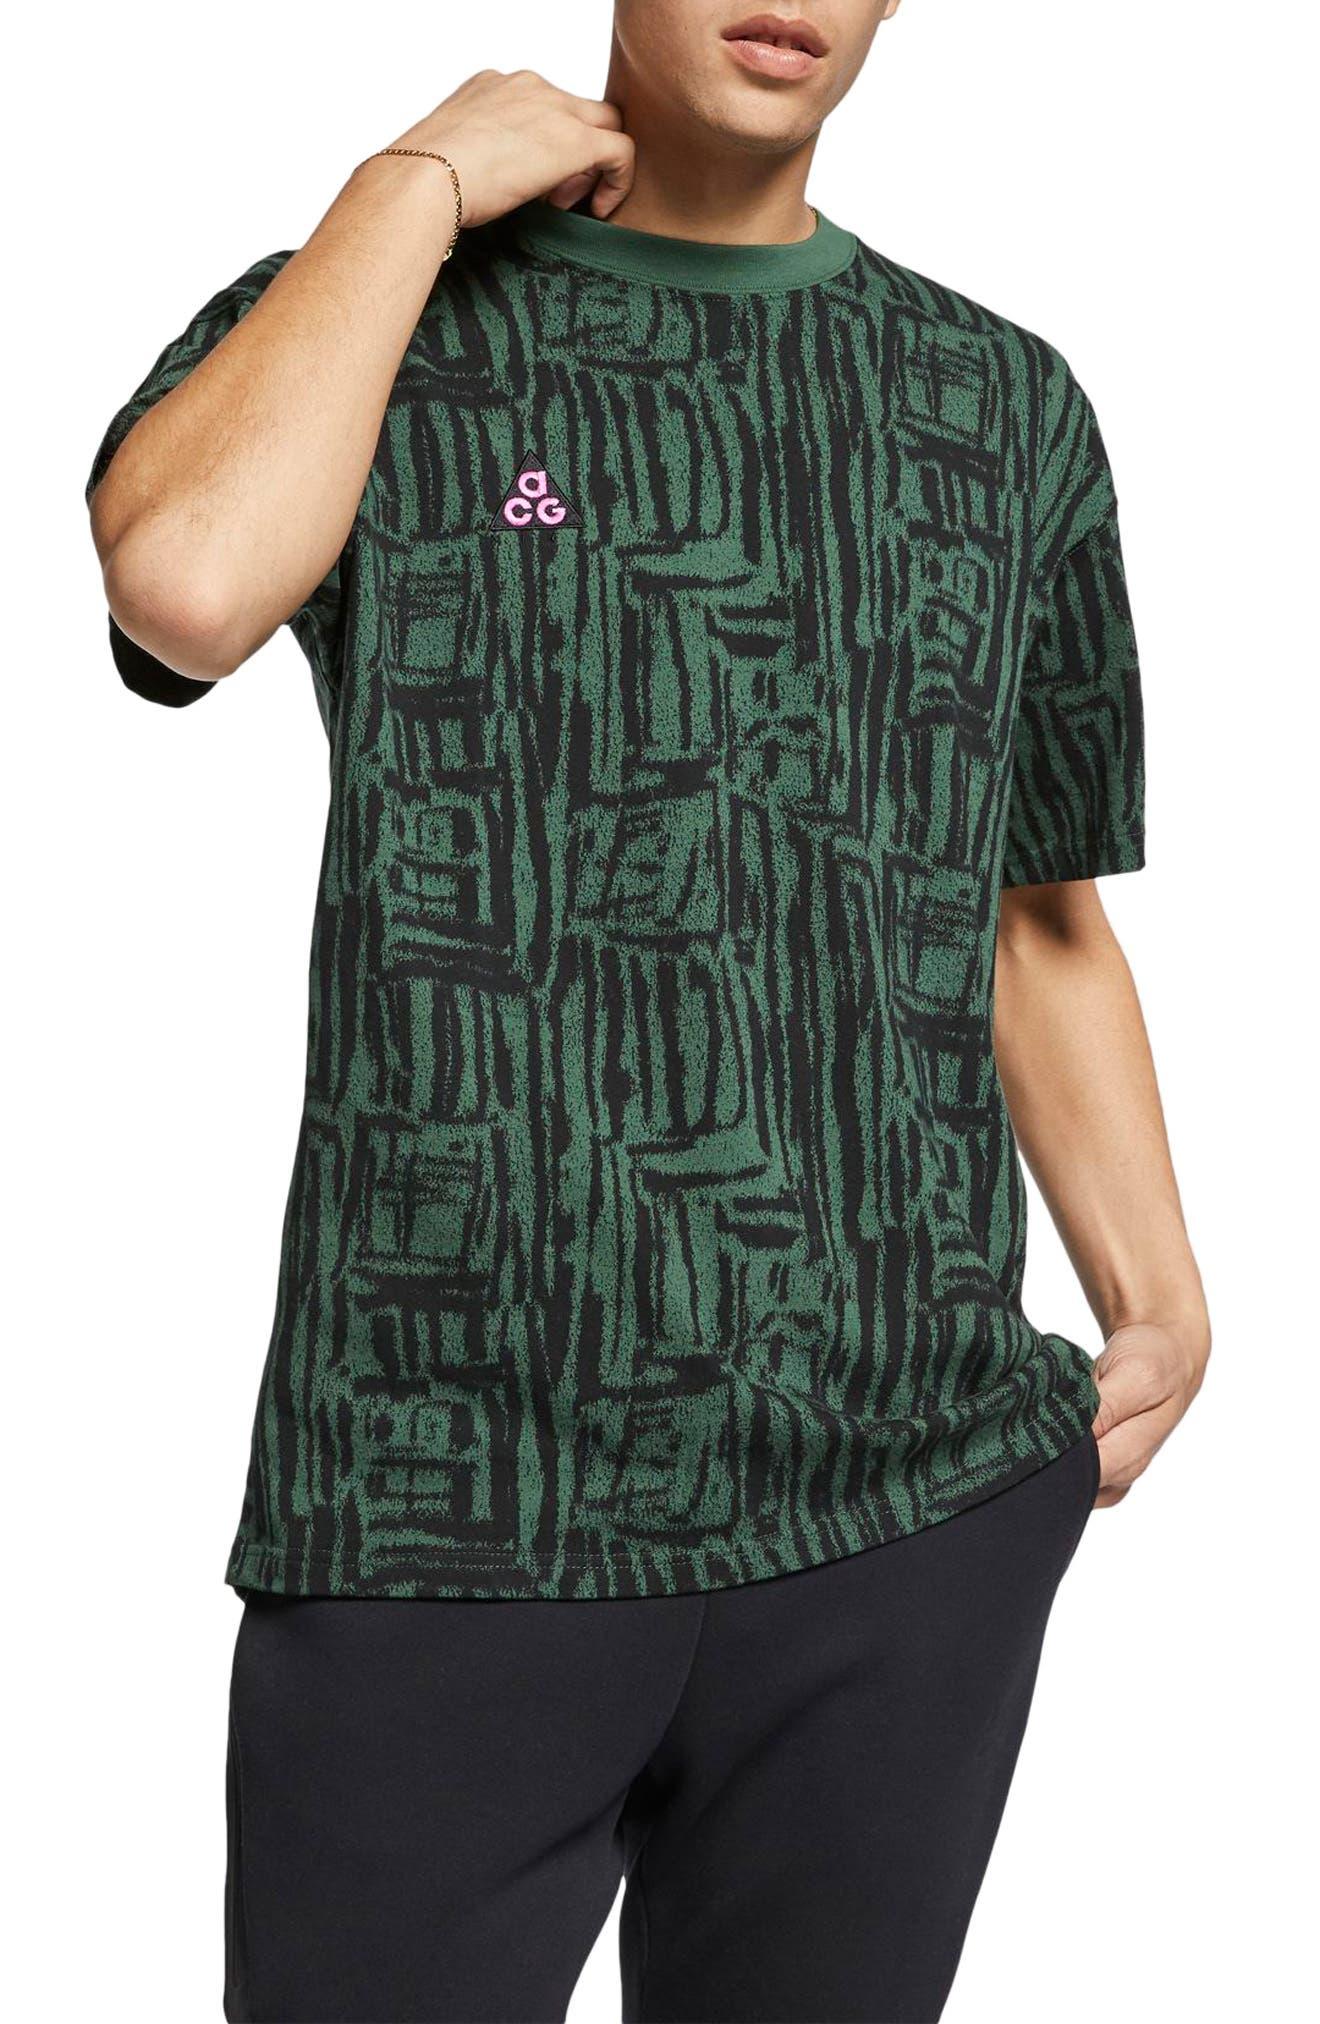 Nike Nrg All Conditions Gear Print Logo T-Shirt, Green